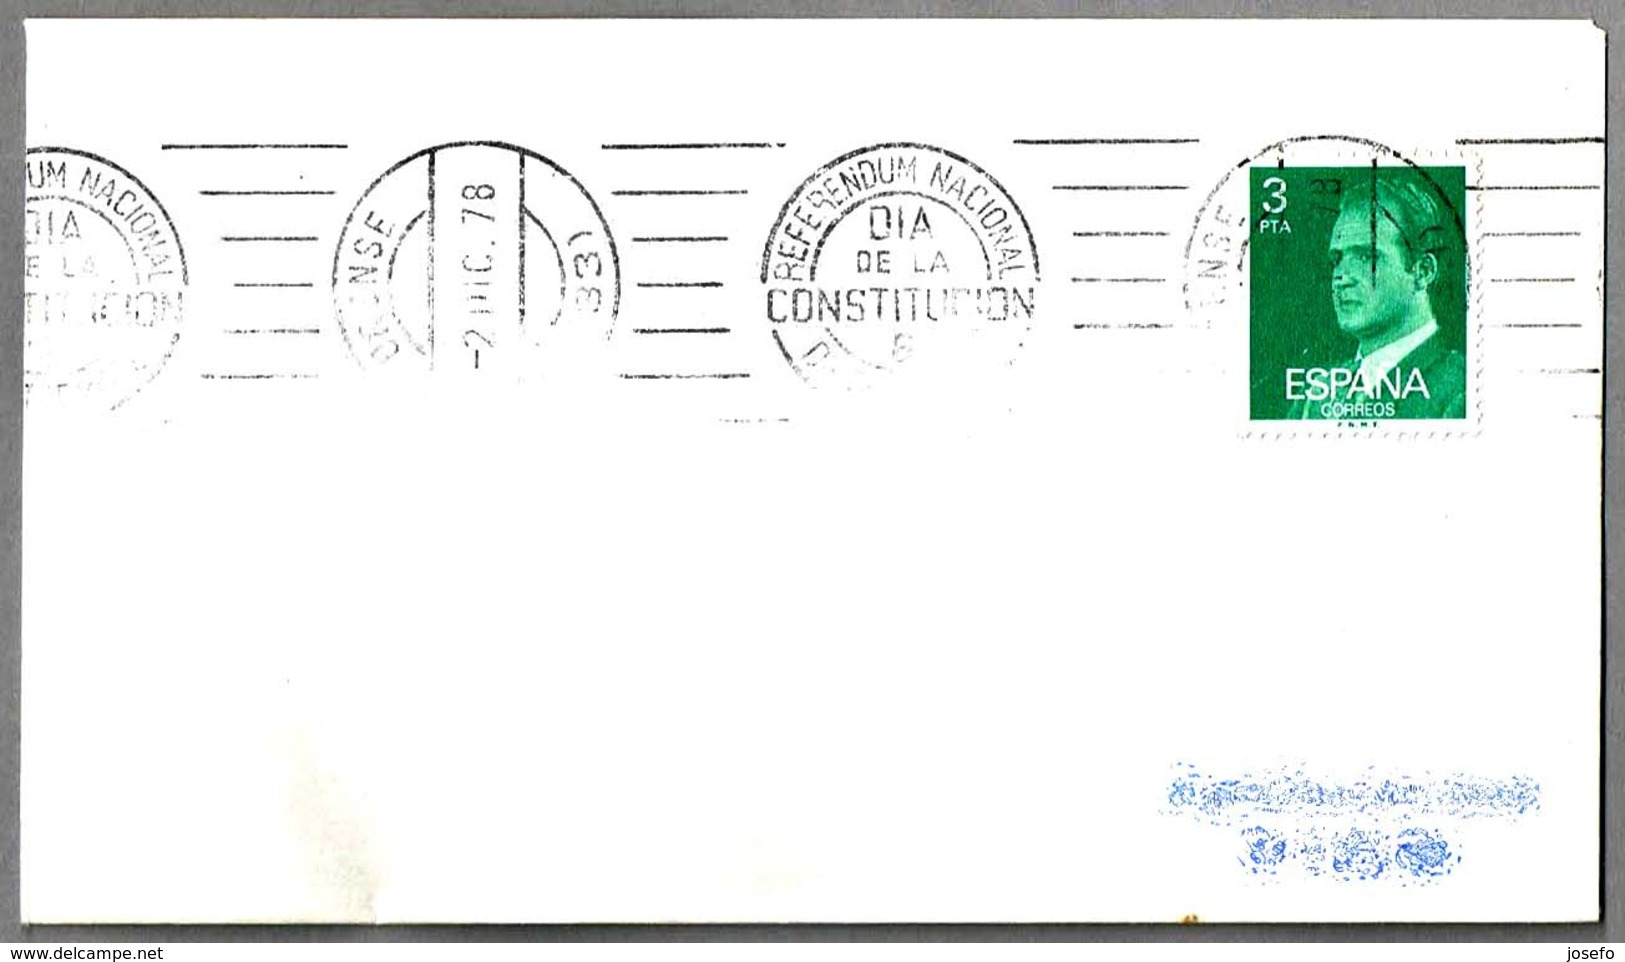 Rodillo REFERENDUM NACIONAL - DIA DE LA CONSTITUCION - 6 DE DICIEMBRE. Orense, Galicia, 1978 - 1931-Hoy: 2ª República - ... Juan Carlos I